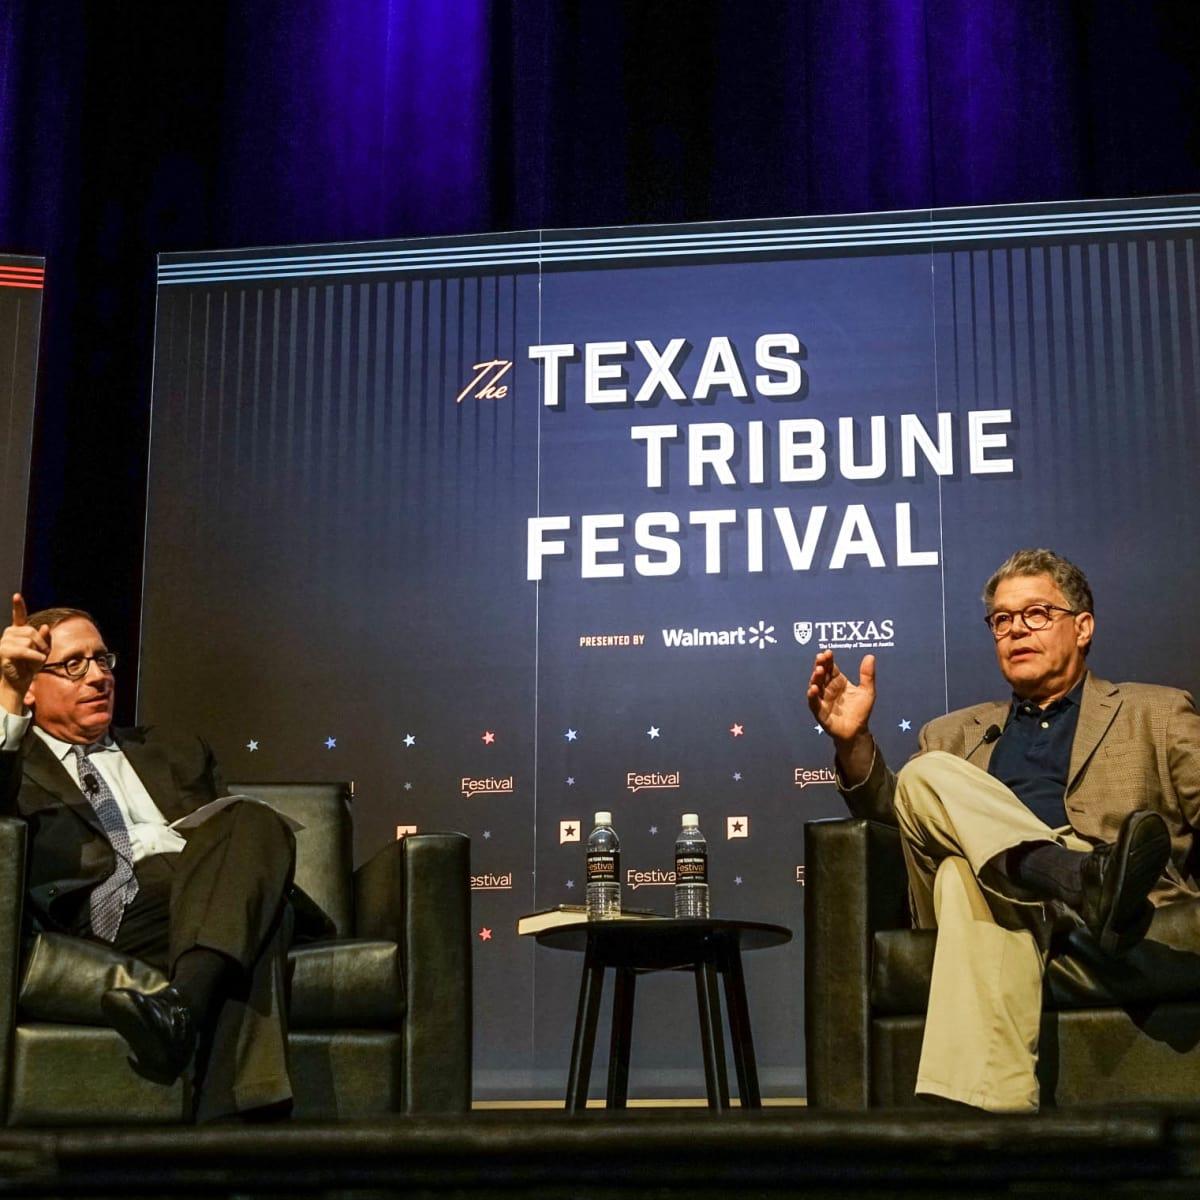 Texas Tribune Festival 2017 Opening Keynote Evan Smith Al Franken